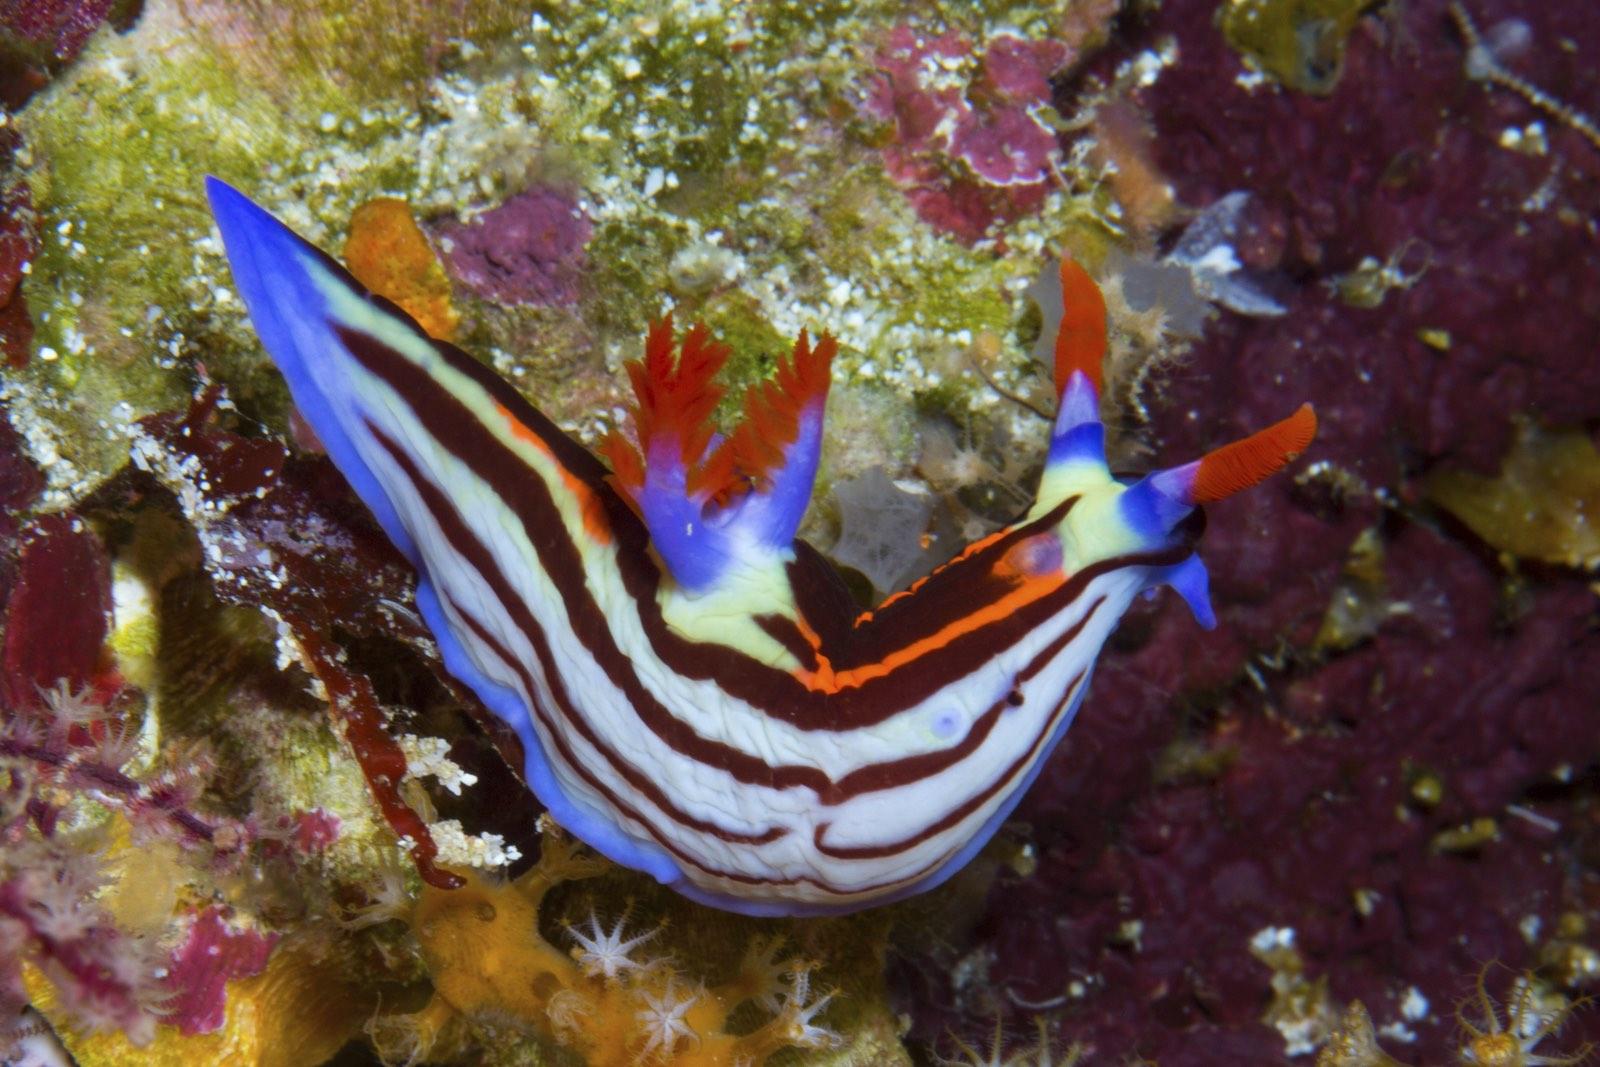 A nudibranch seen swimming on a sea floor near Timor-Leste, Atauro Island. Photo copyright: Conservation International/Photo by Mark Erdmann